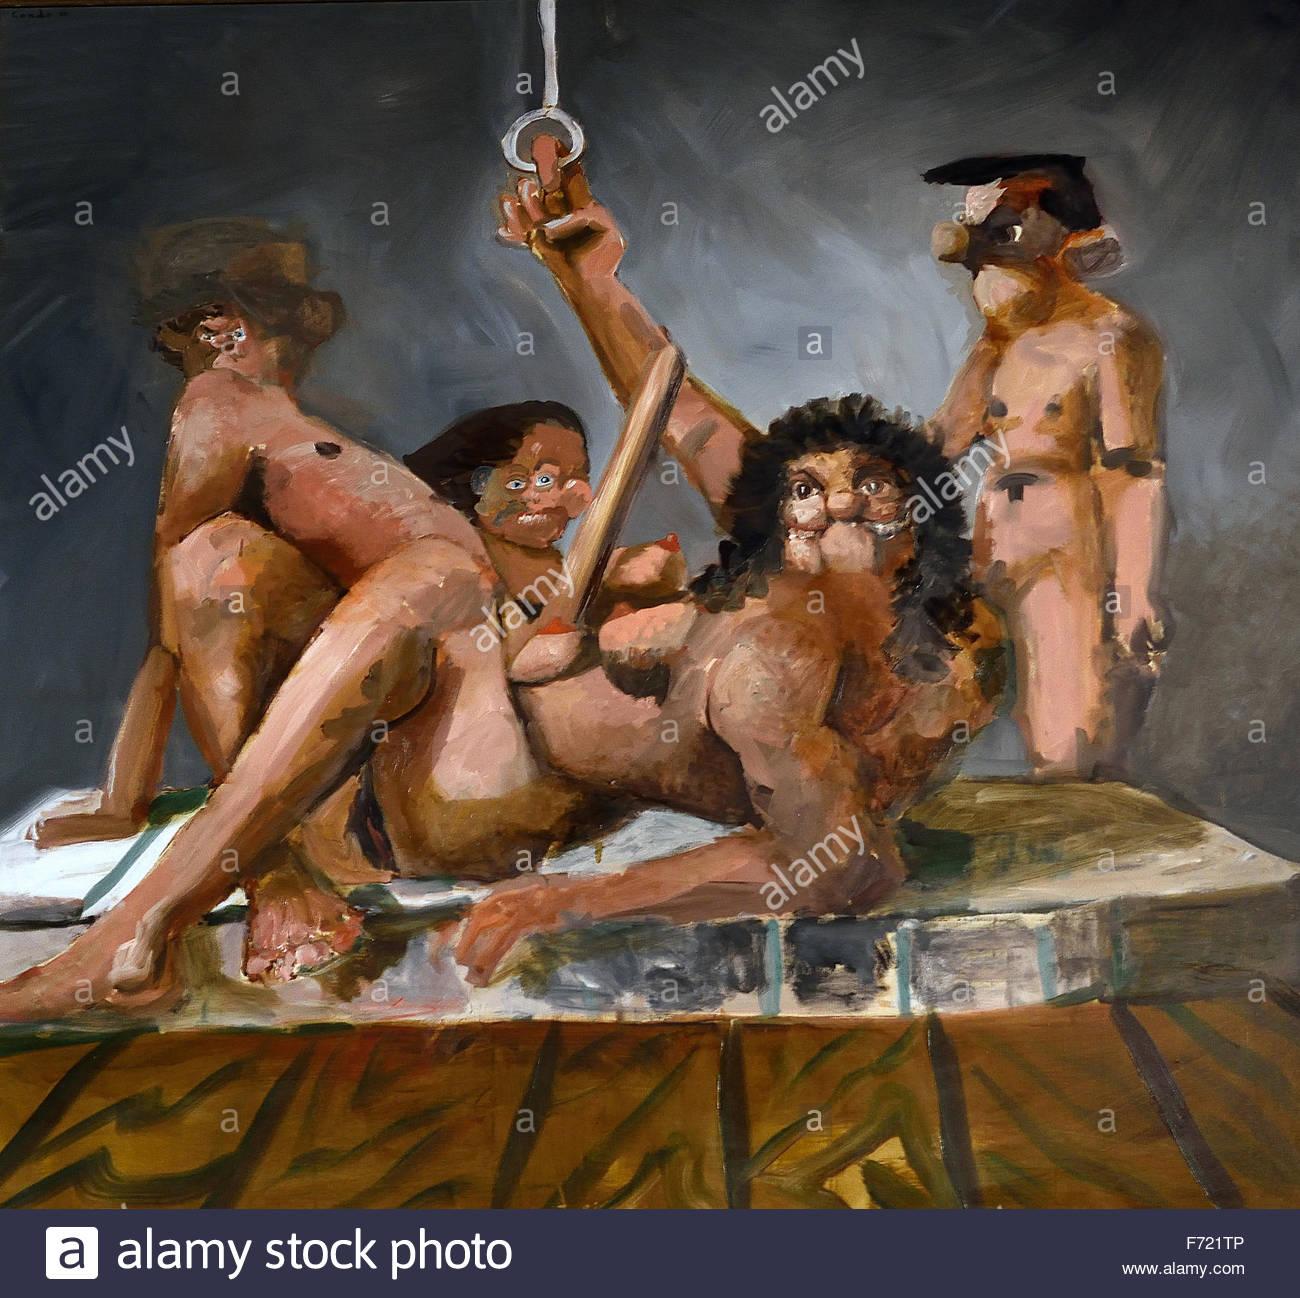 Sex through the anal